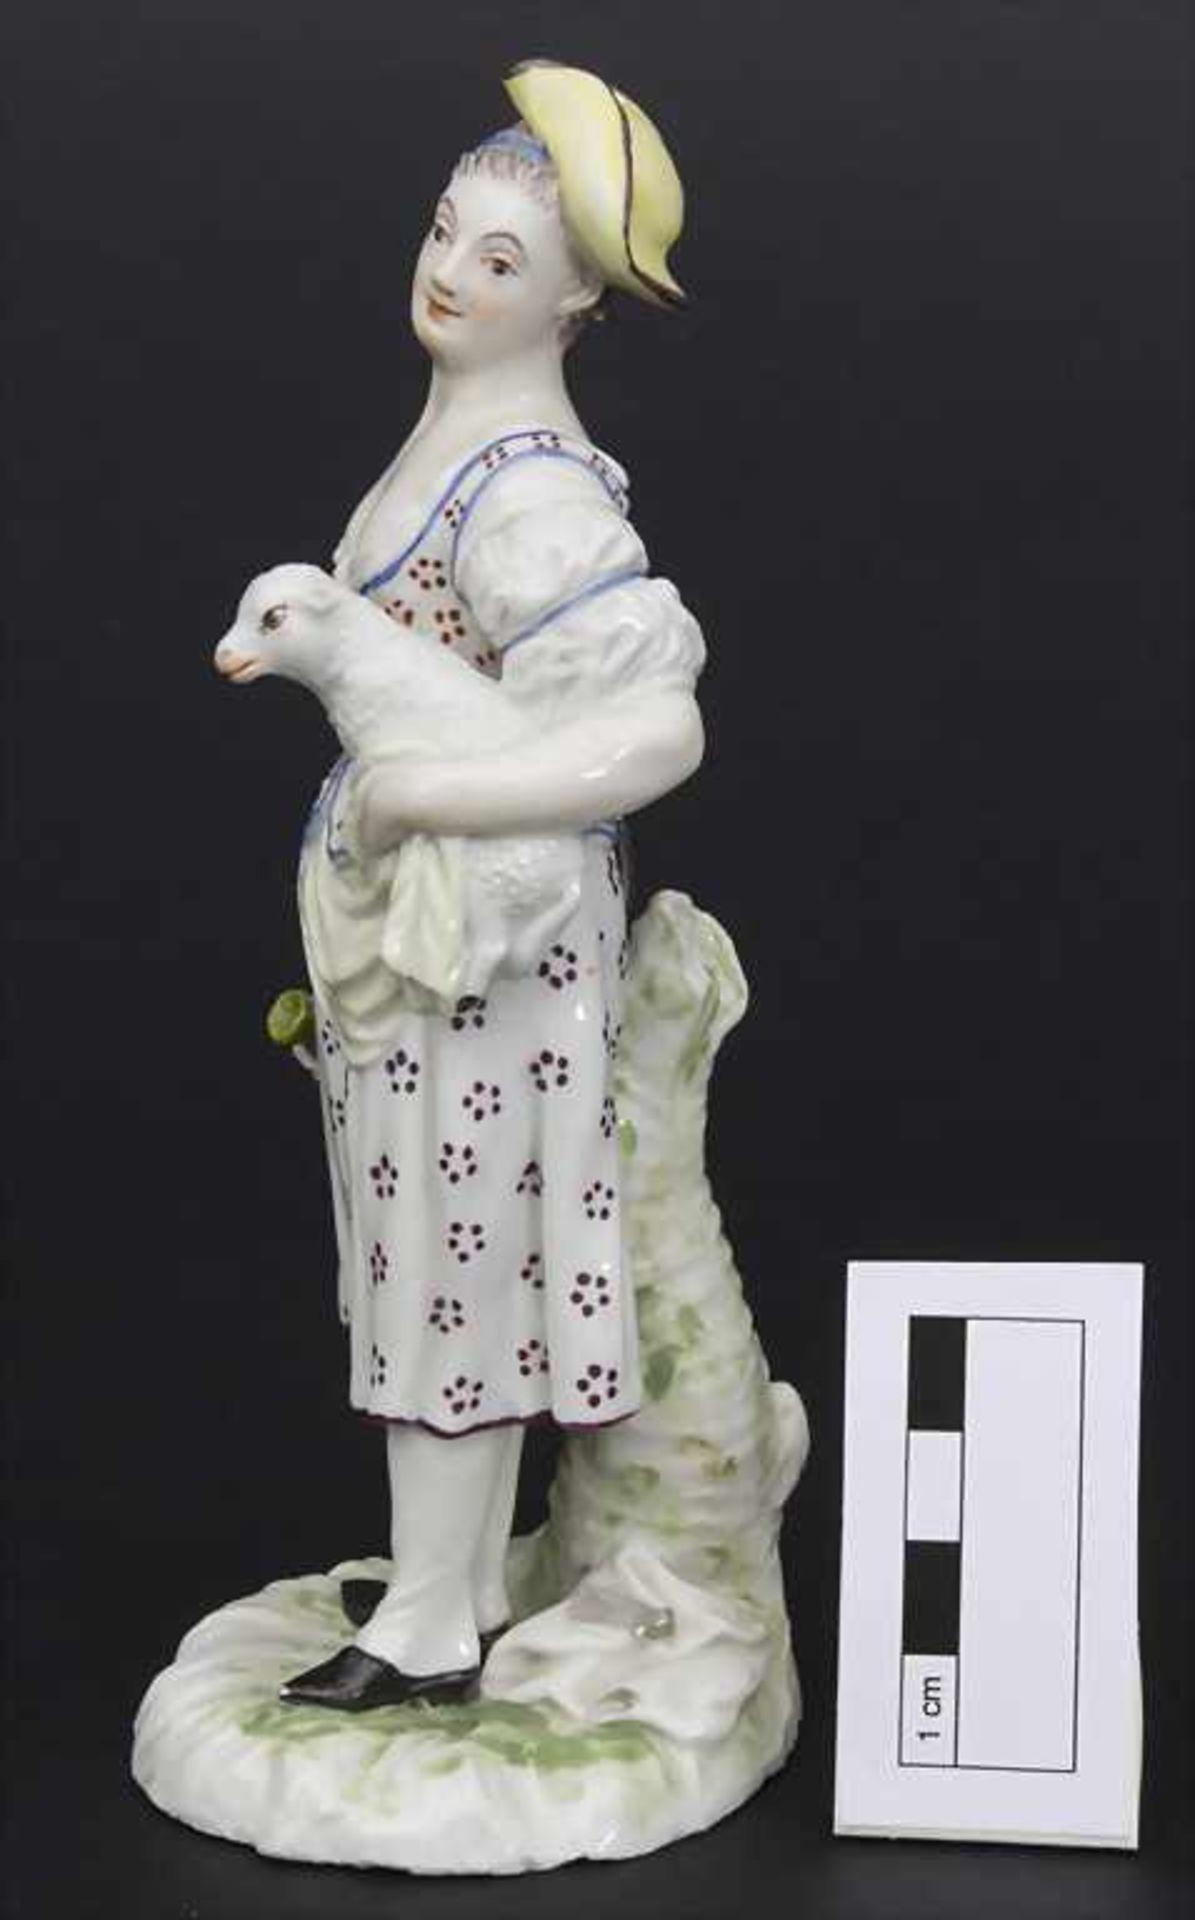 Schäferin mit Lamm / A shepherdess holding a lamb, wohl Joseph Nees, Ludwigsburg, 1760-67 - Bild 2 aus 8